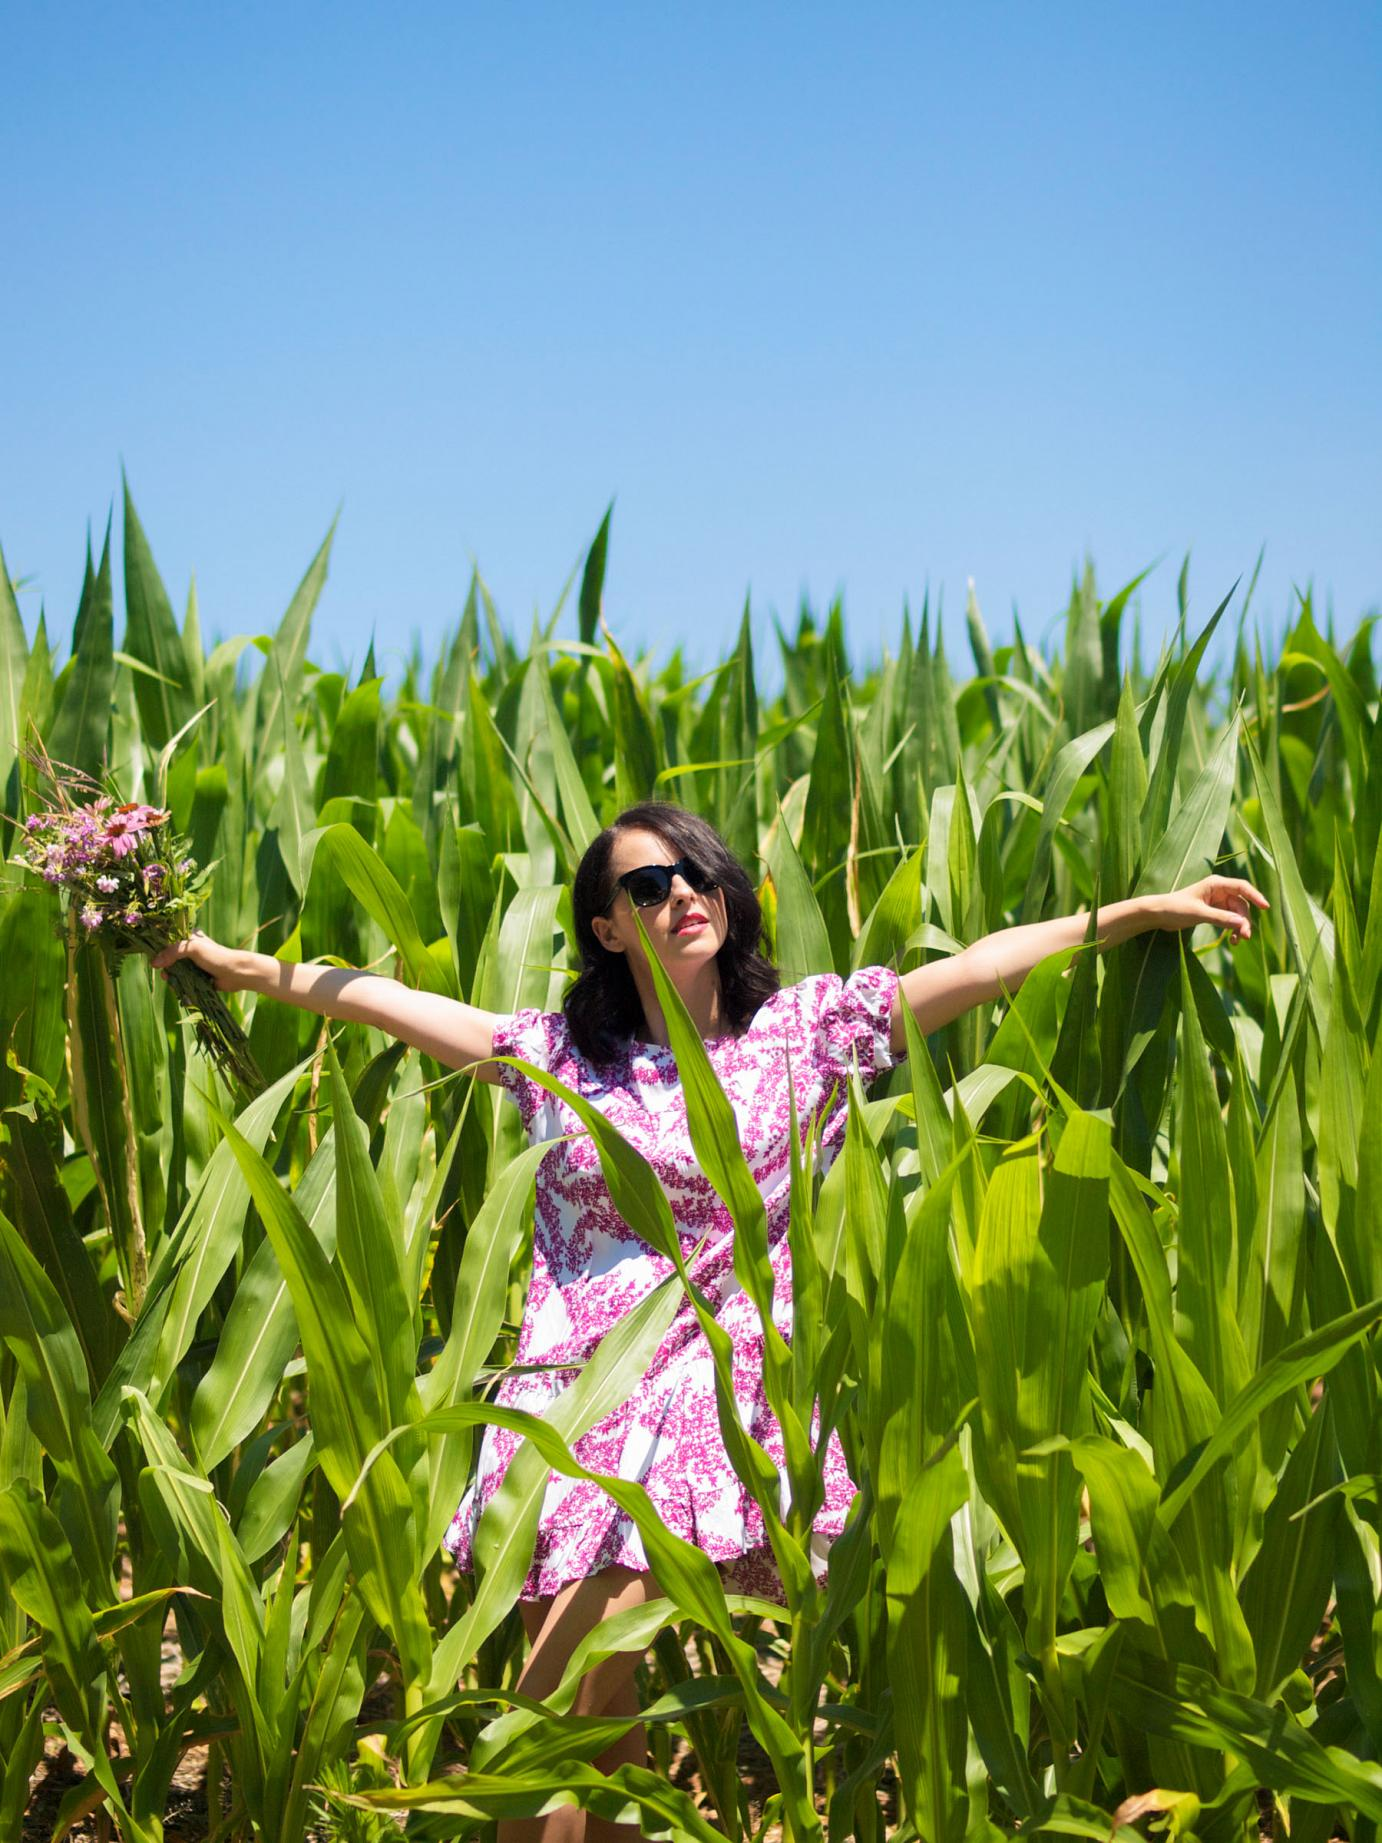 bitterswee tcolours, weekend look, floral dress, summer style, corn field, wild flowers, zara sandals, pink, en plein air, H&M dress, summer dress,